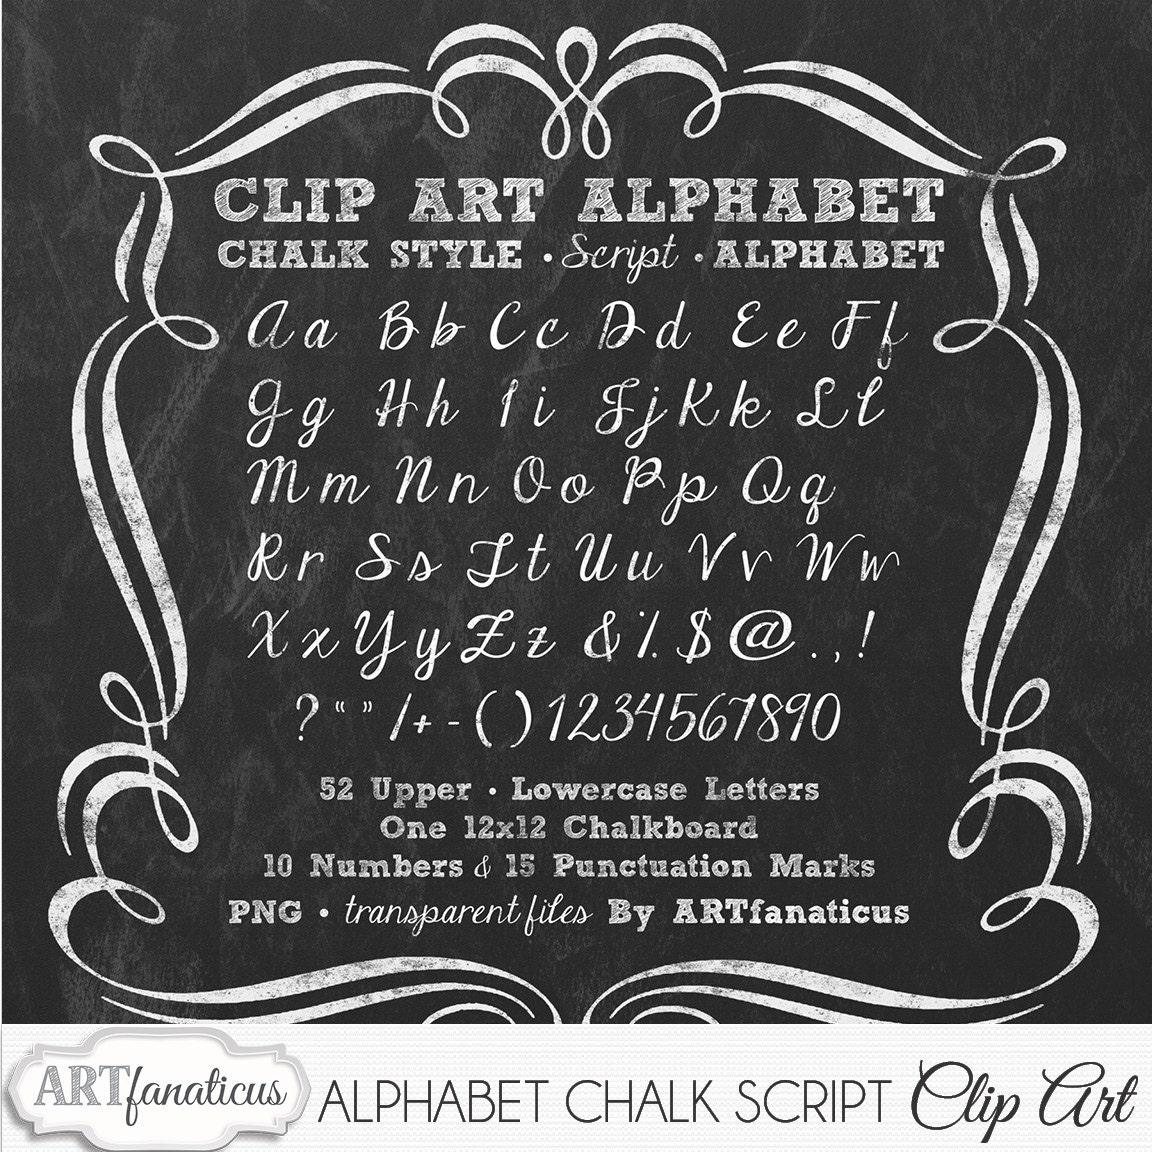 chalkboard clip art alphabet chalk script 1